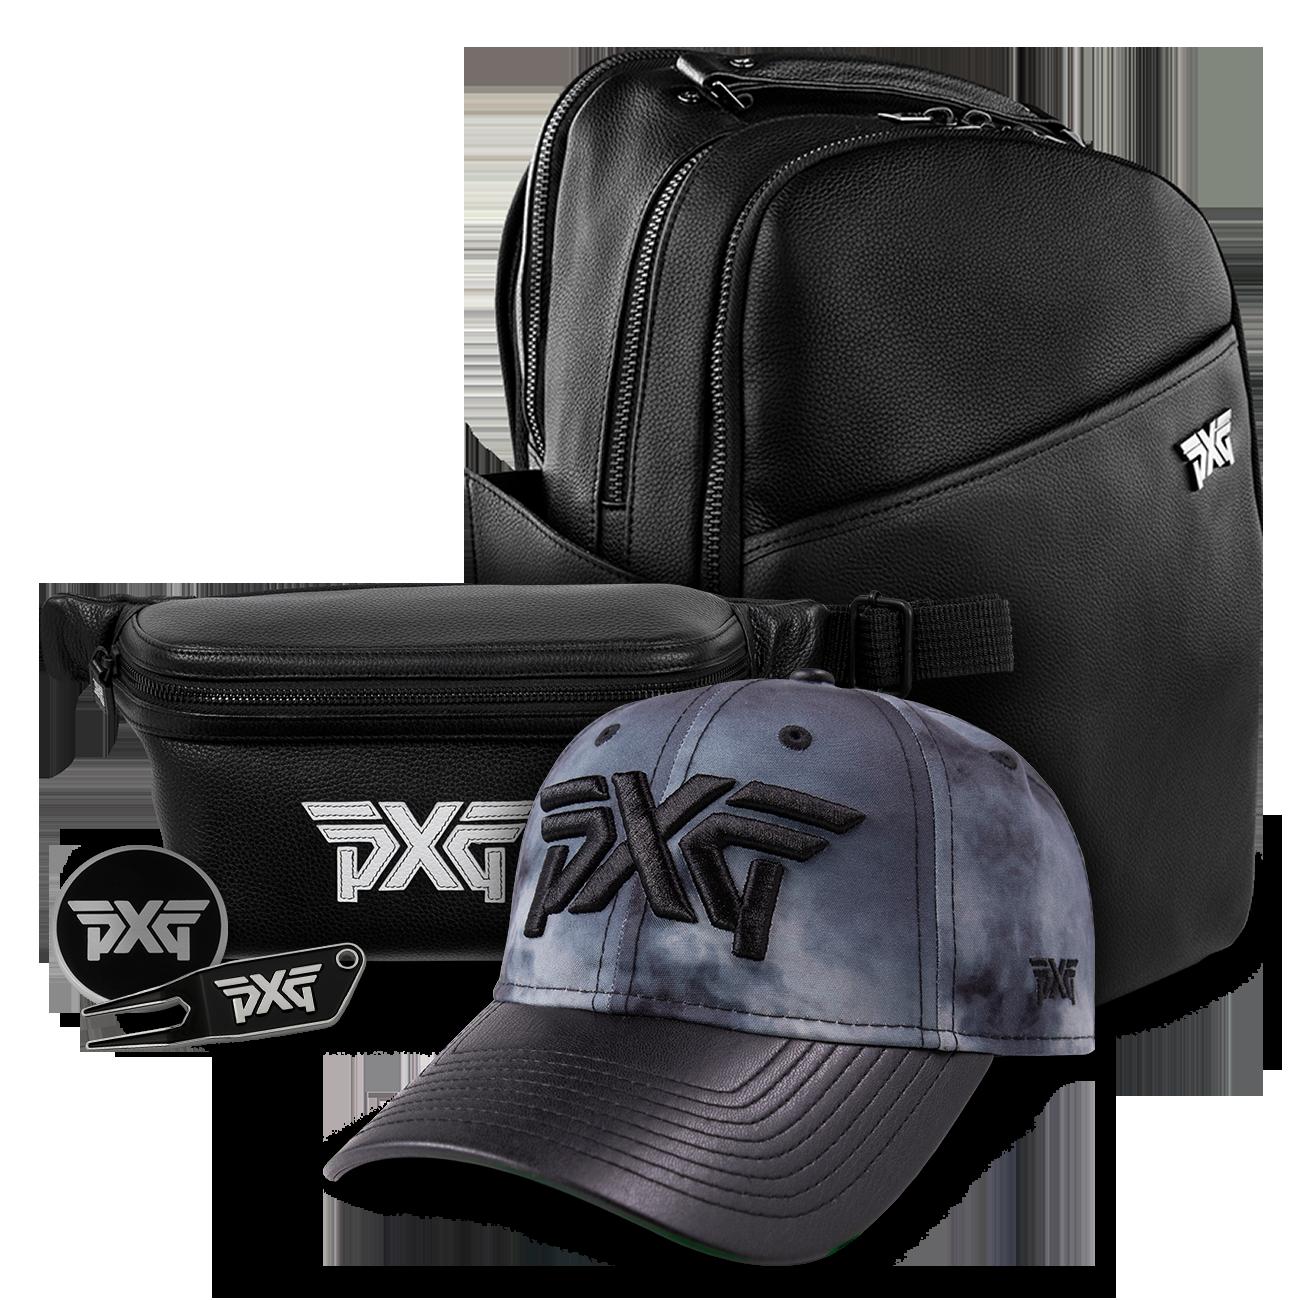 PXG Accessories